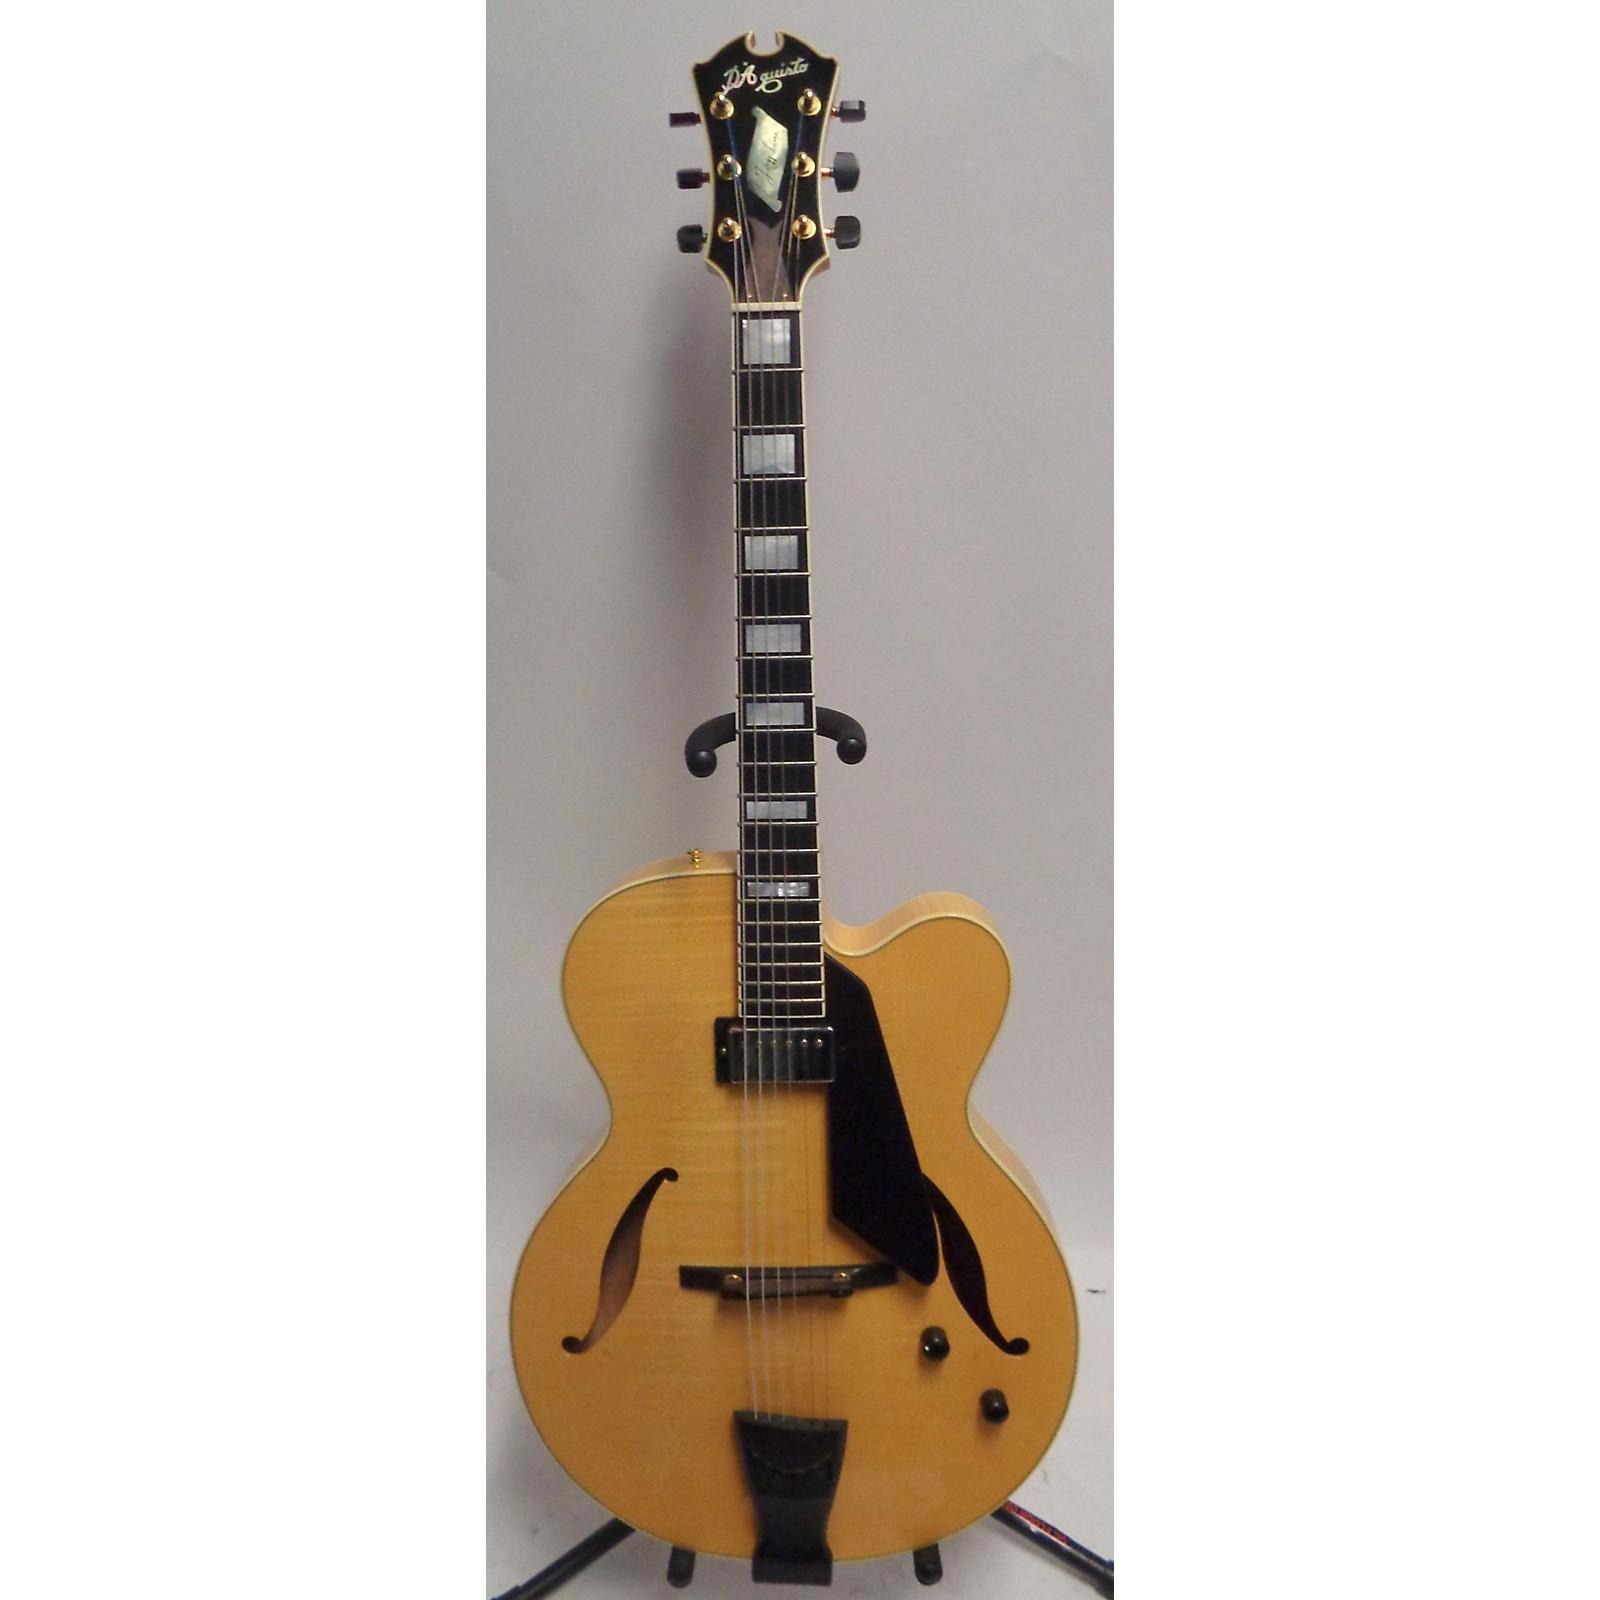 D'Aquisto DQ Jazz Line Hollow Body Electric Guitar